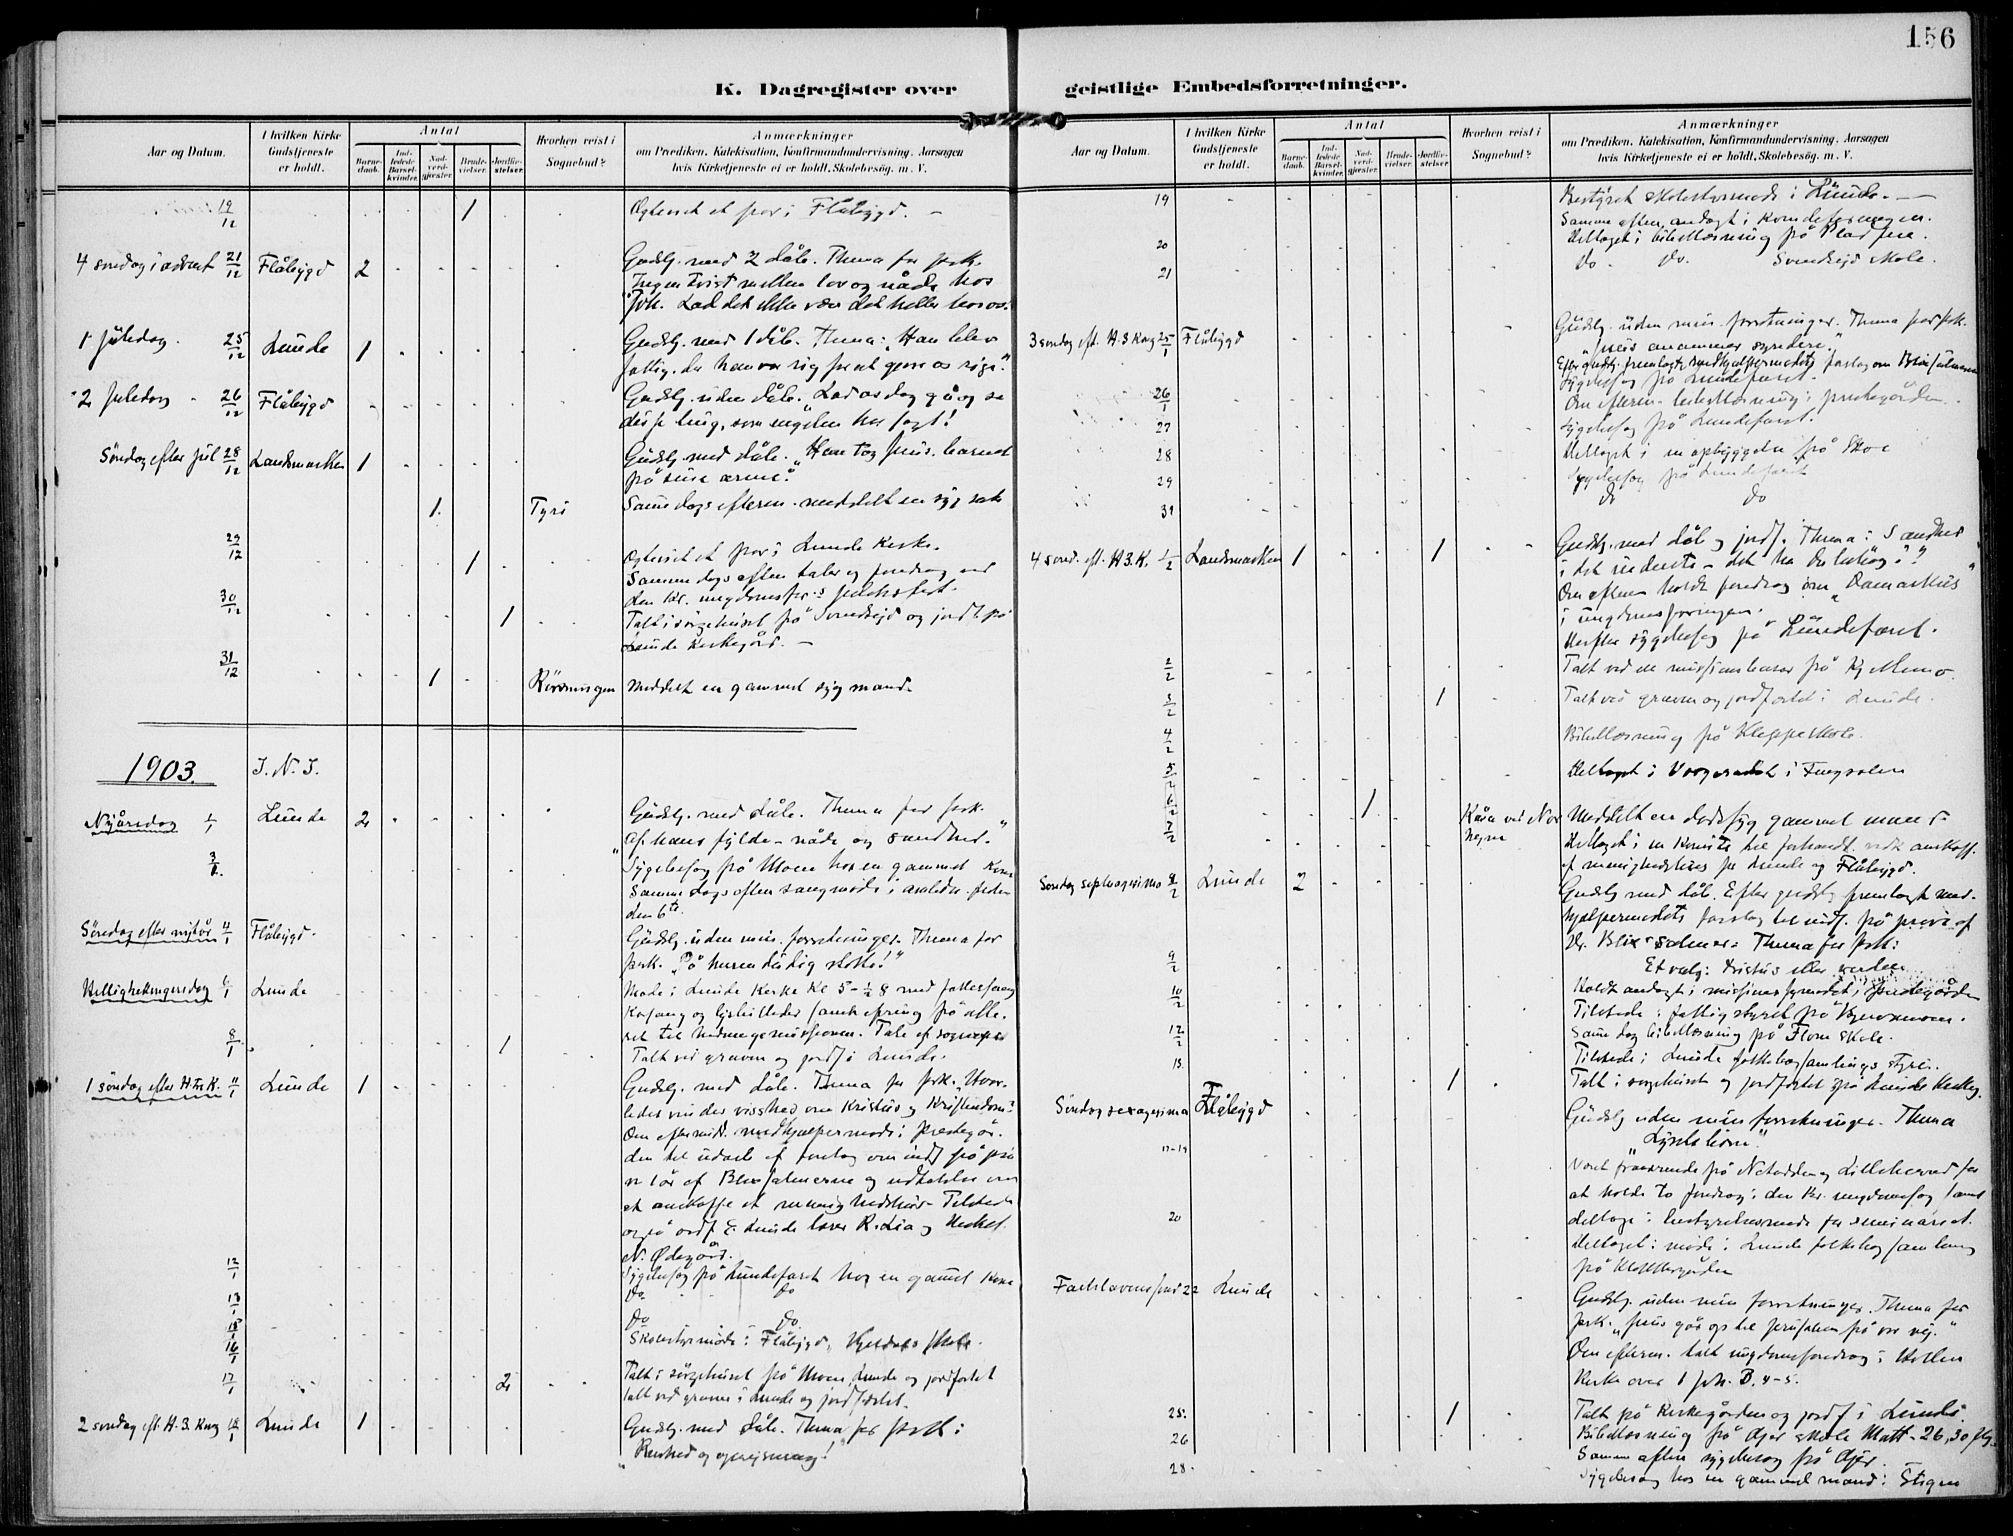 SAKO, Lunde kirkebøker, F/Fa/L0004: Ministerialbok nr. I 4, 1902-1913, s. 156